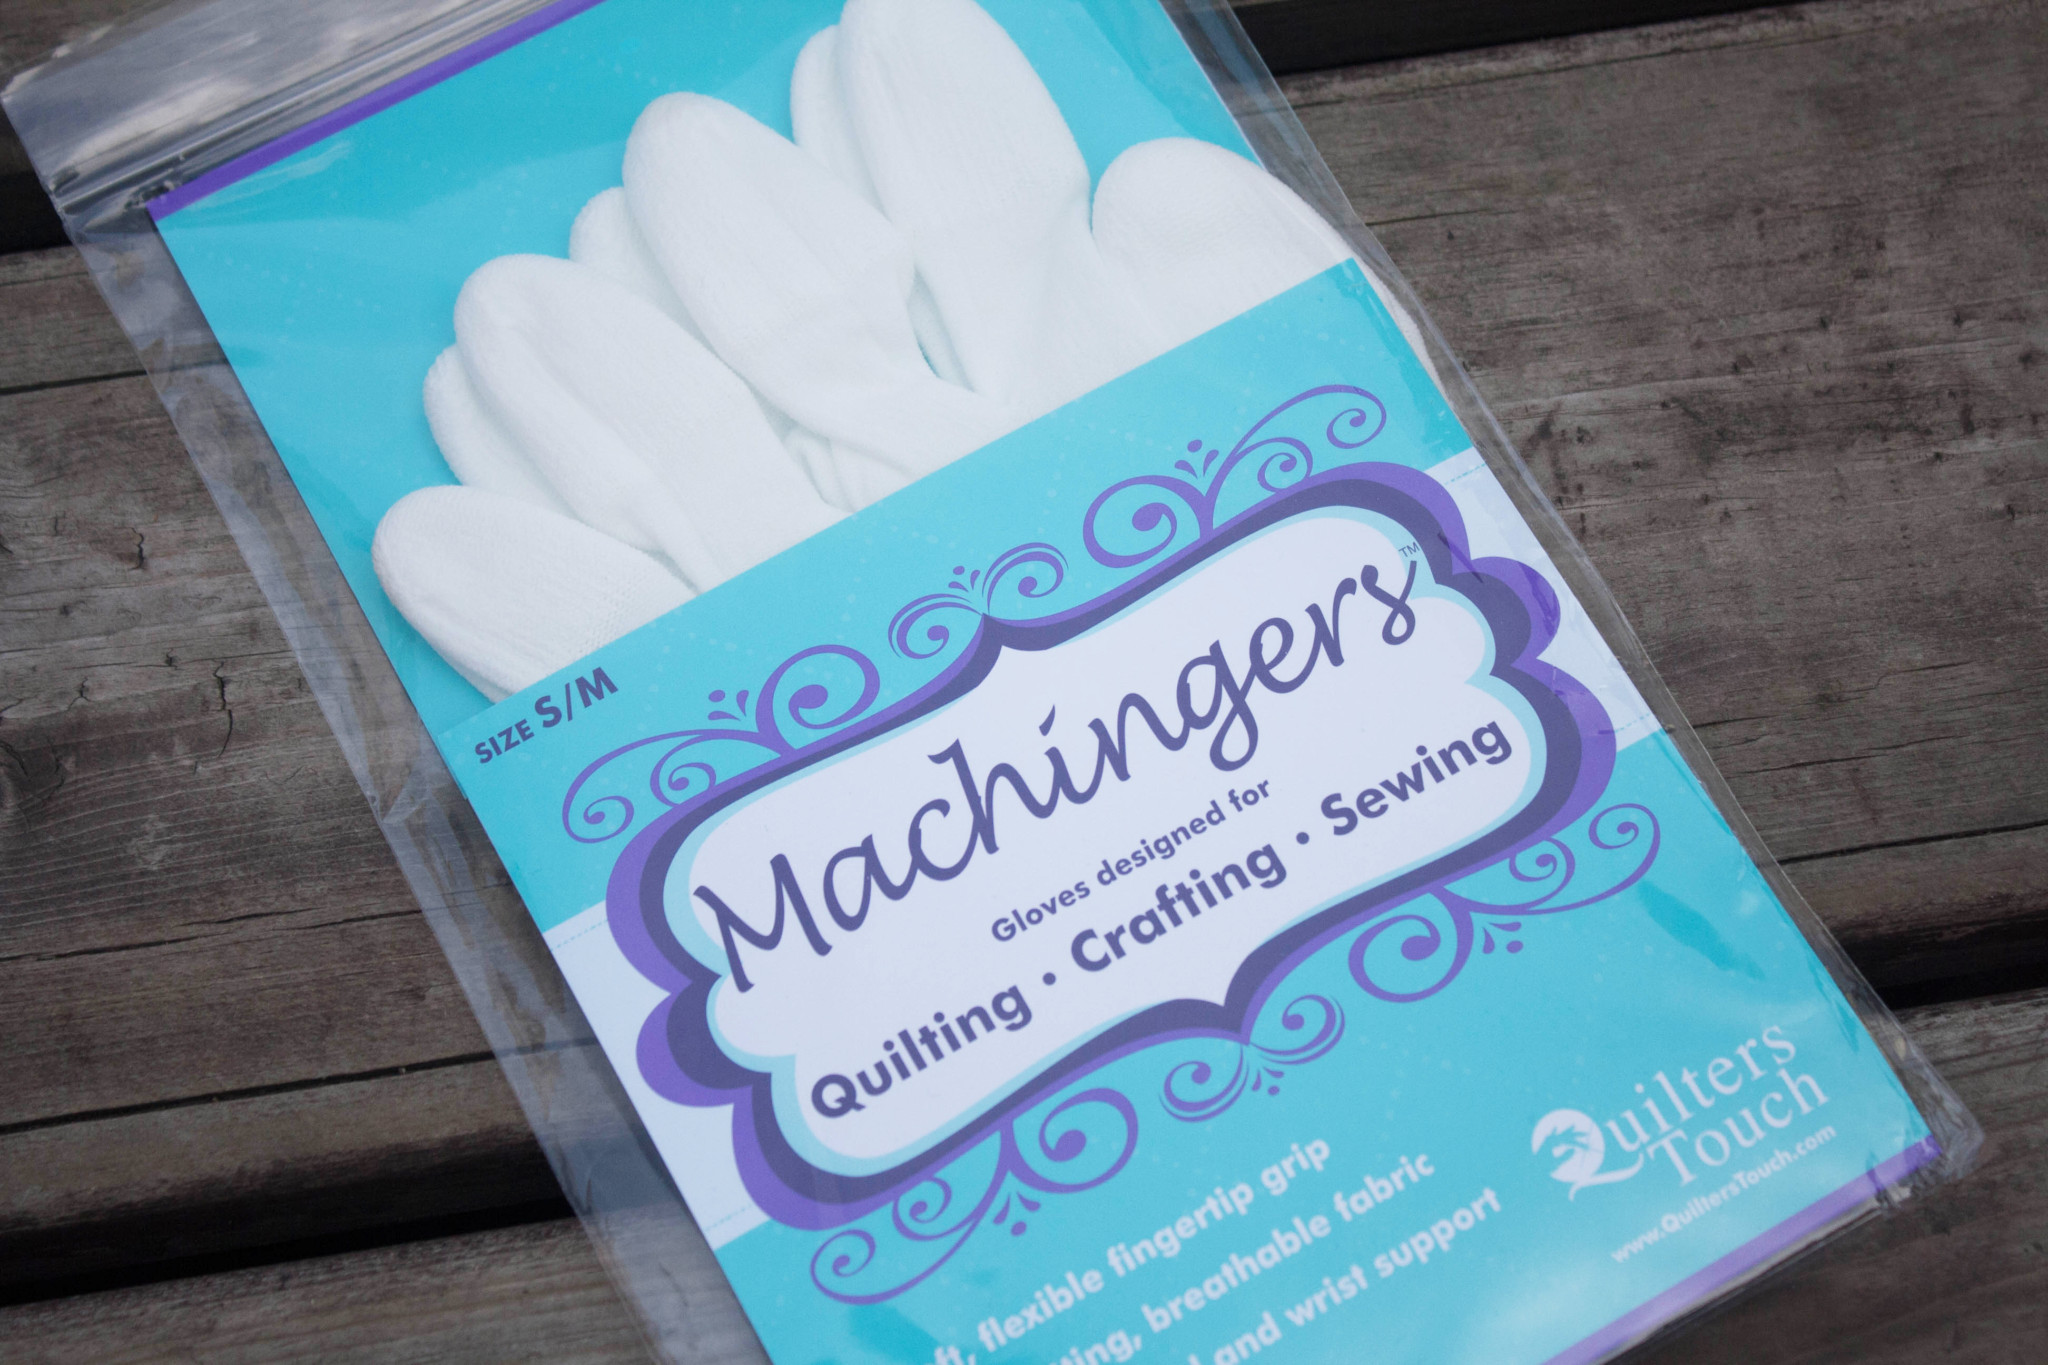 16 Cool Sewing Tools - Sew Sweetness : cool quilting gadgets - Adamdwight.com